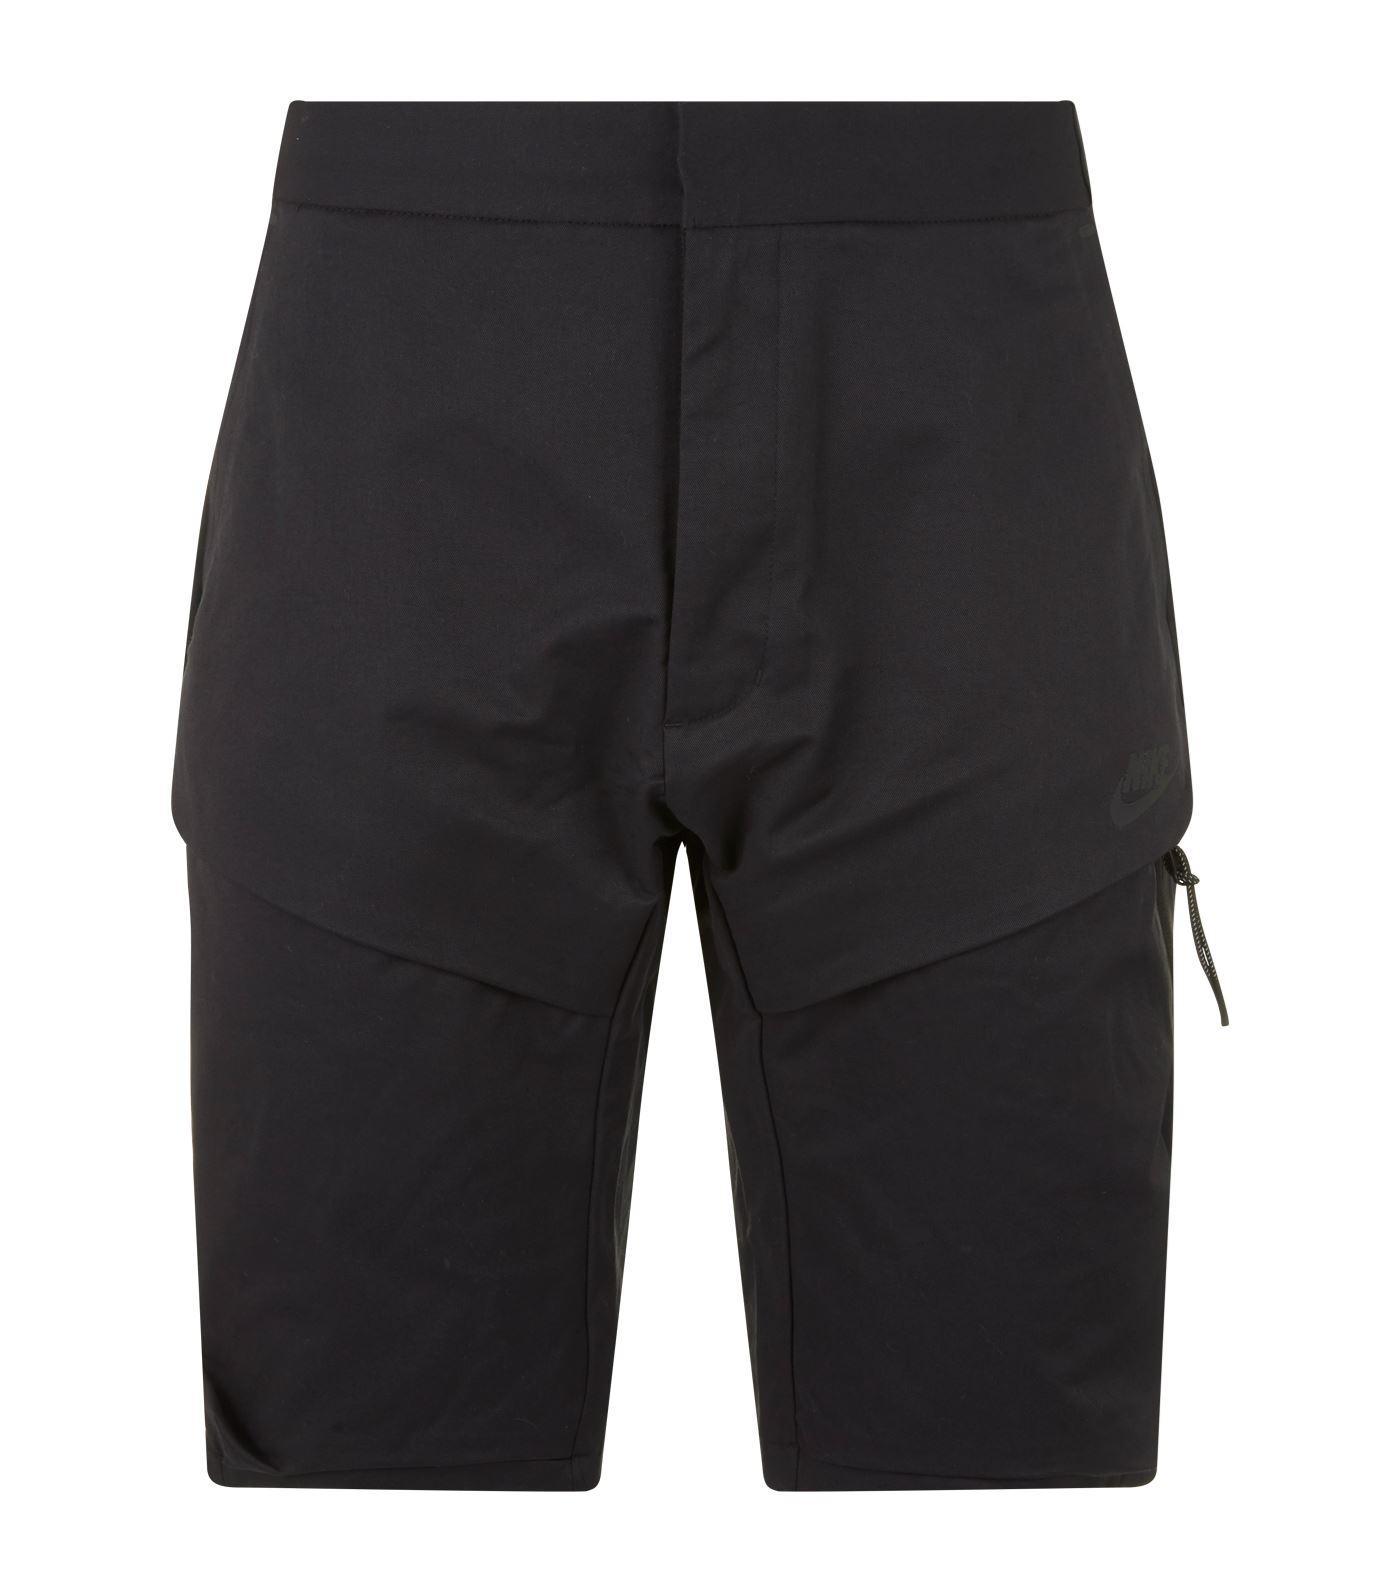 Sweat Nike Lyst Tech For Black Pack Shorts In Men OtWC7nWrfw